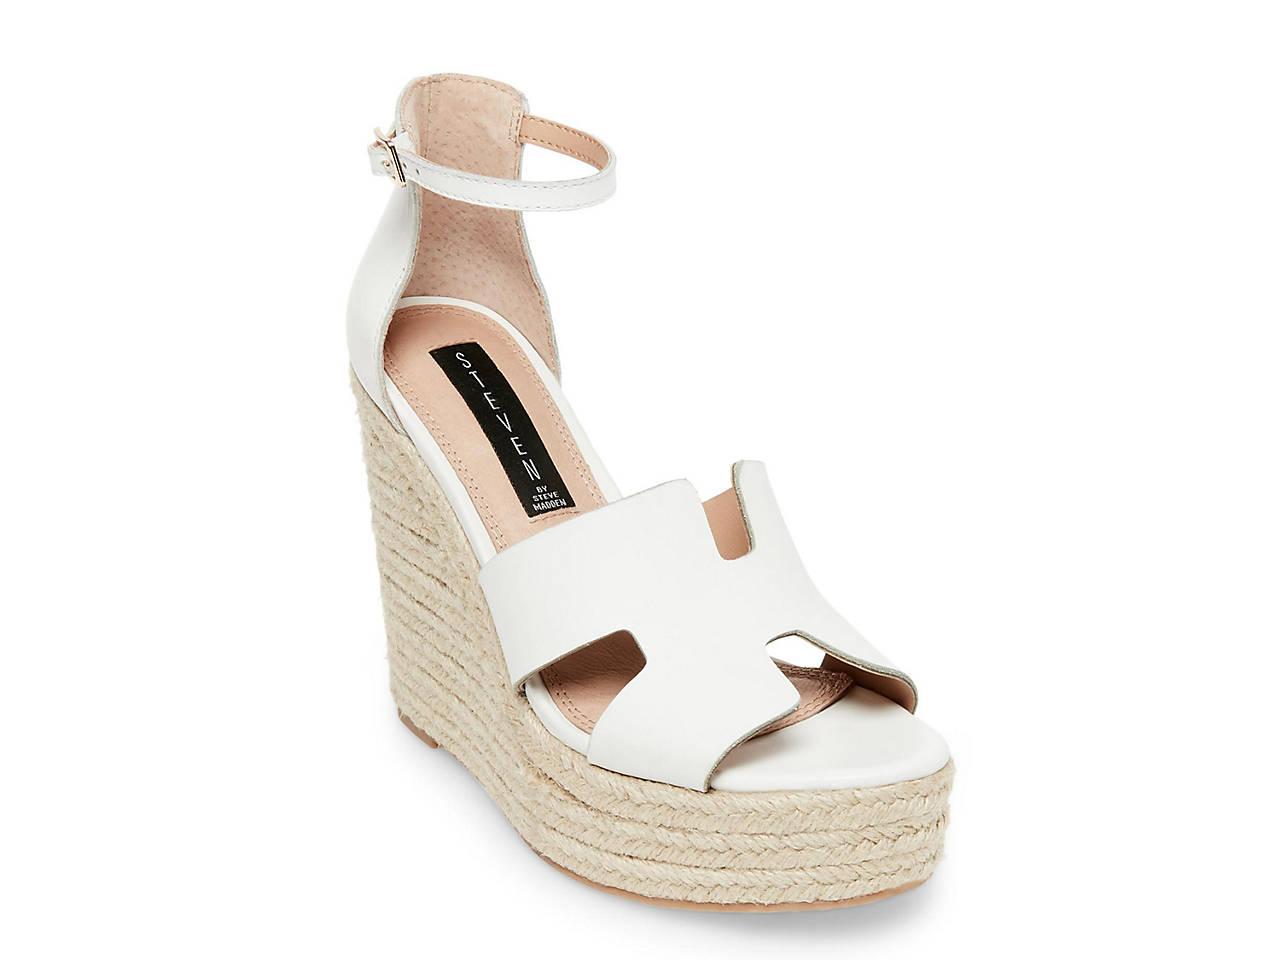 6d0107492c7 Sirena Espadrille Wedge Sandal